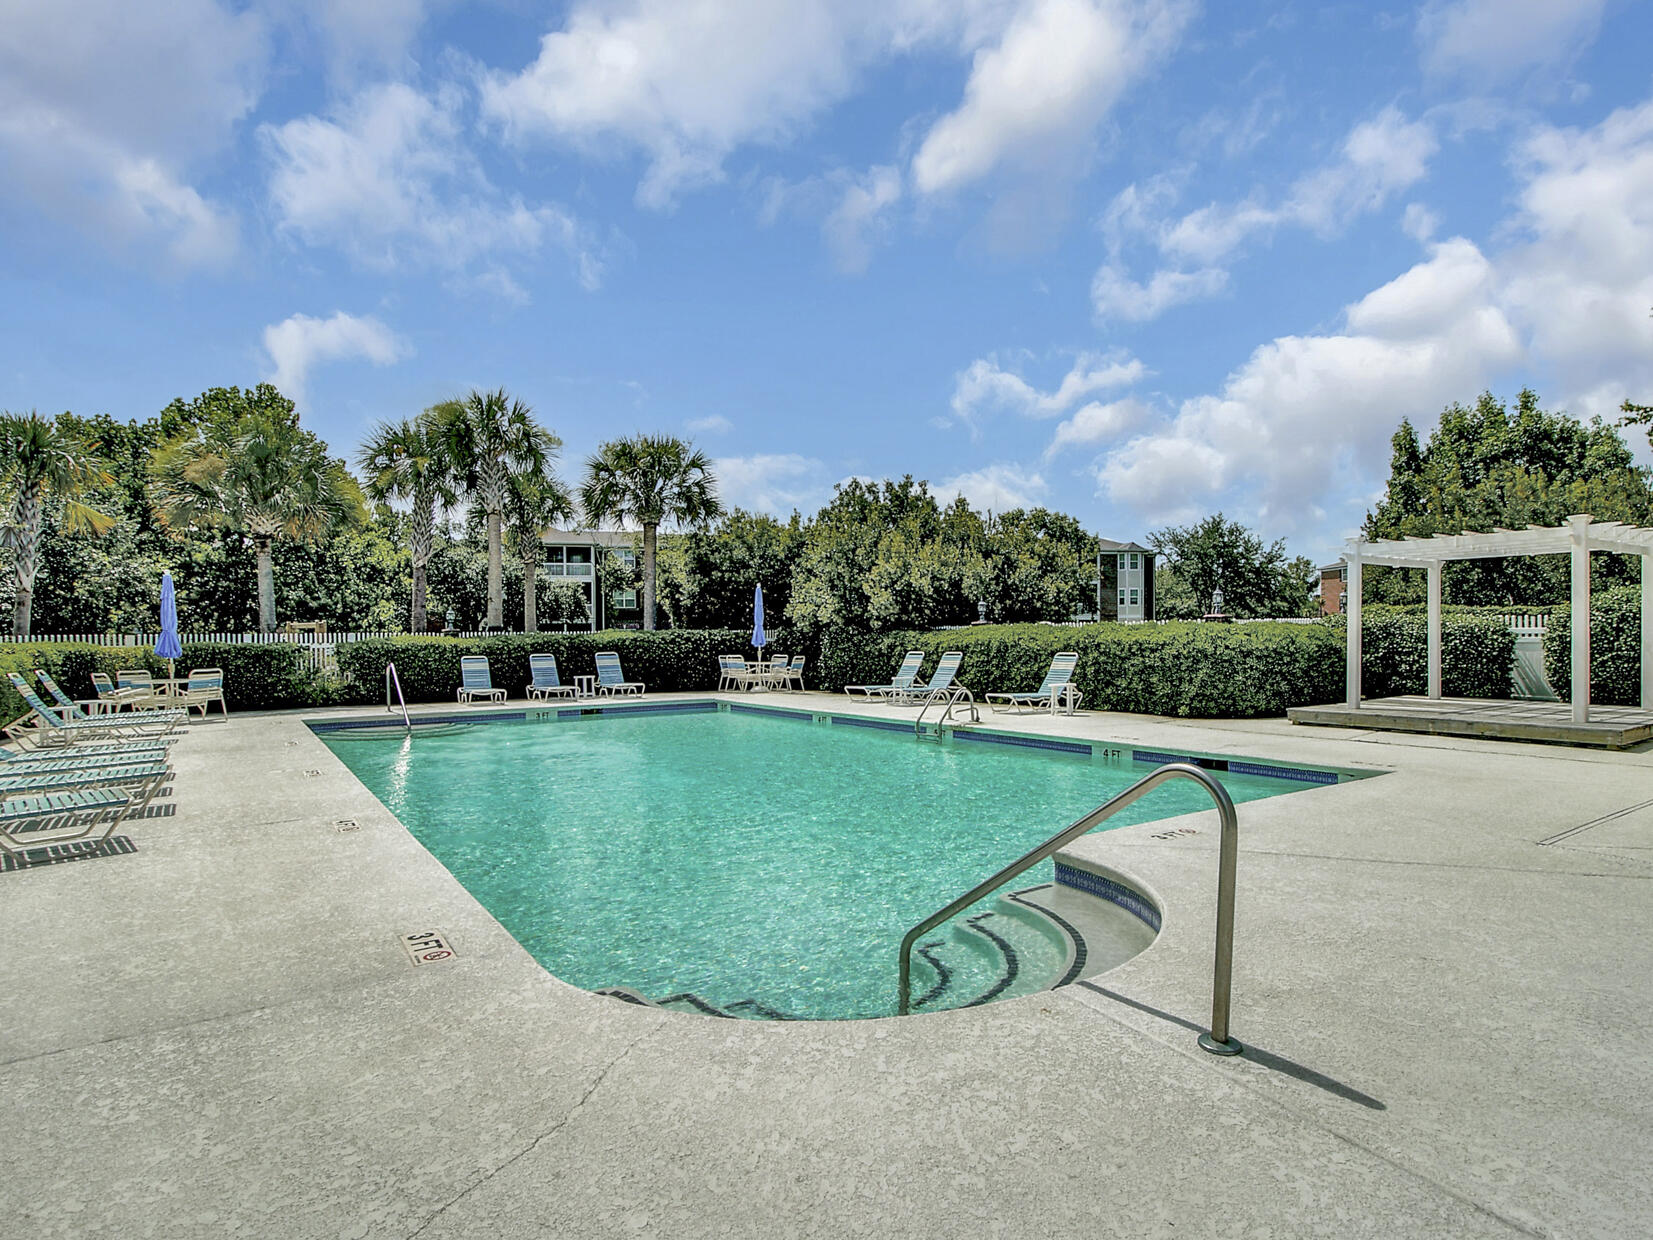 Cambridge Lakes Homes For Sale - 1485 Cambridge Lakes, Mount Pleasant, SC - 12